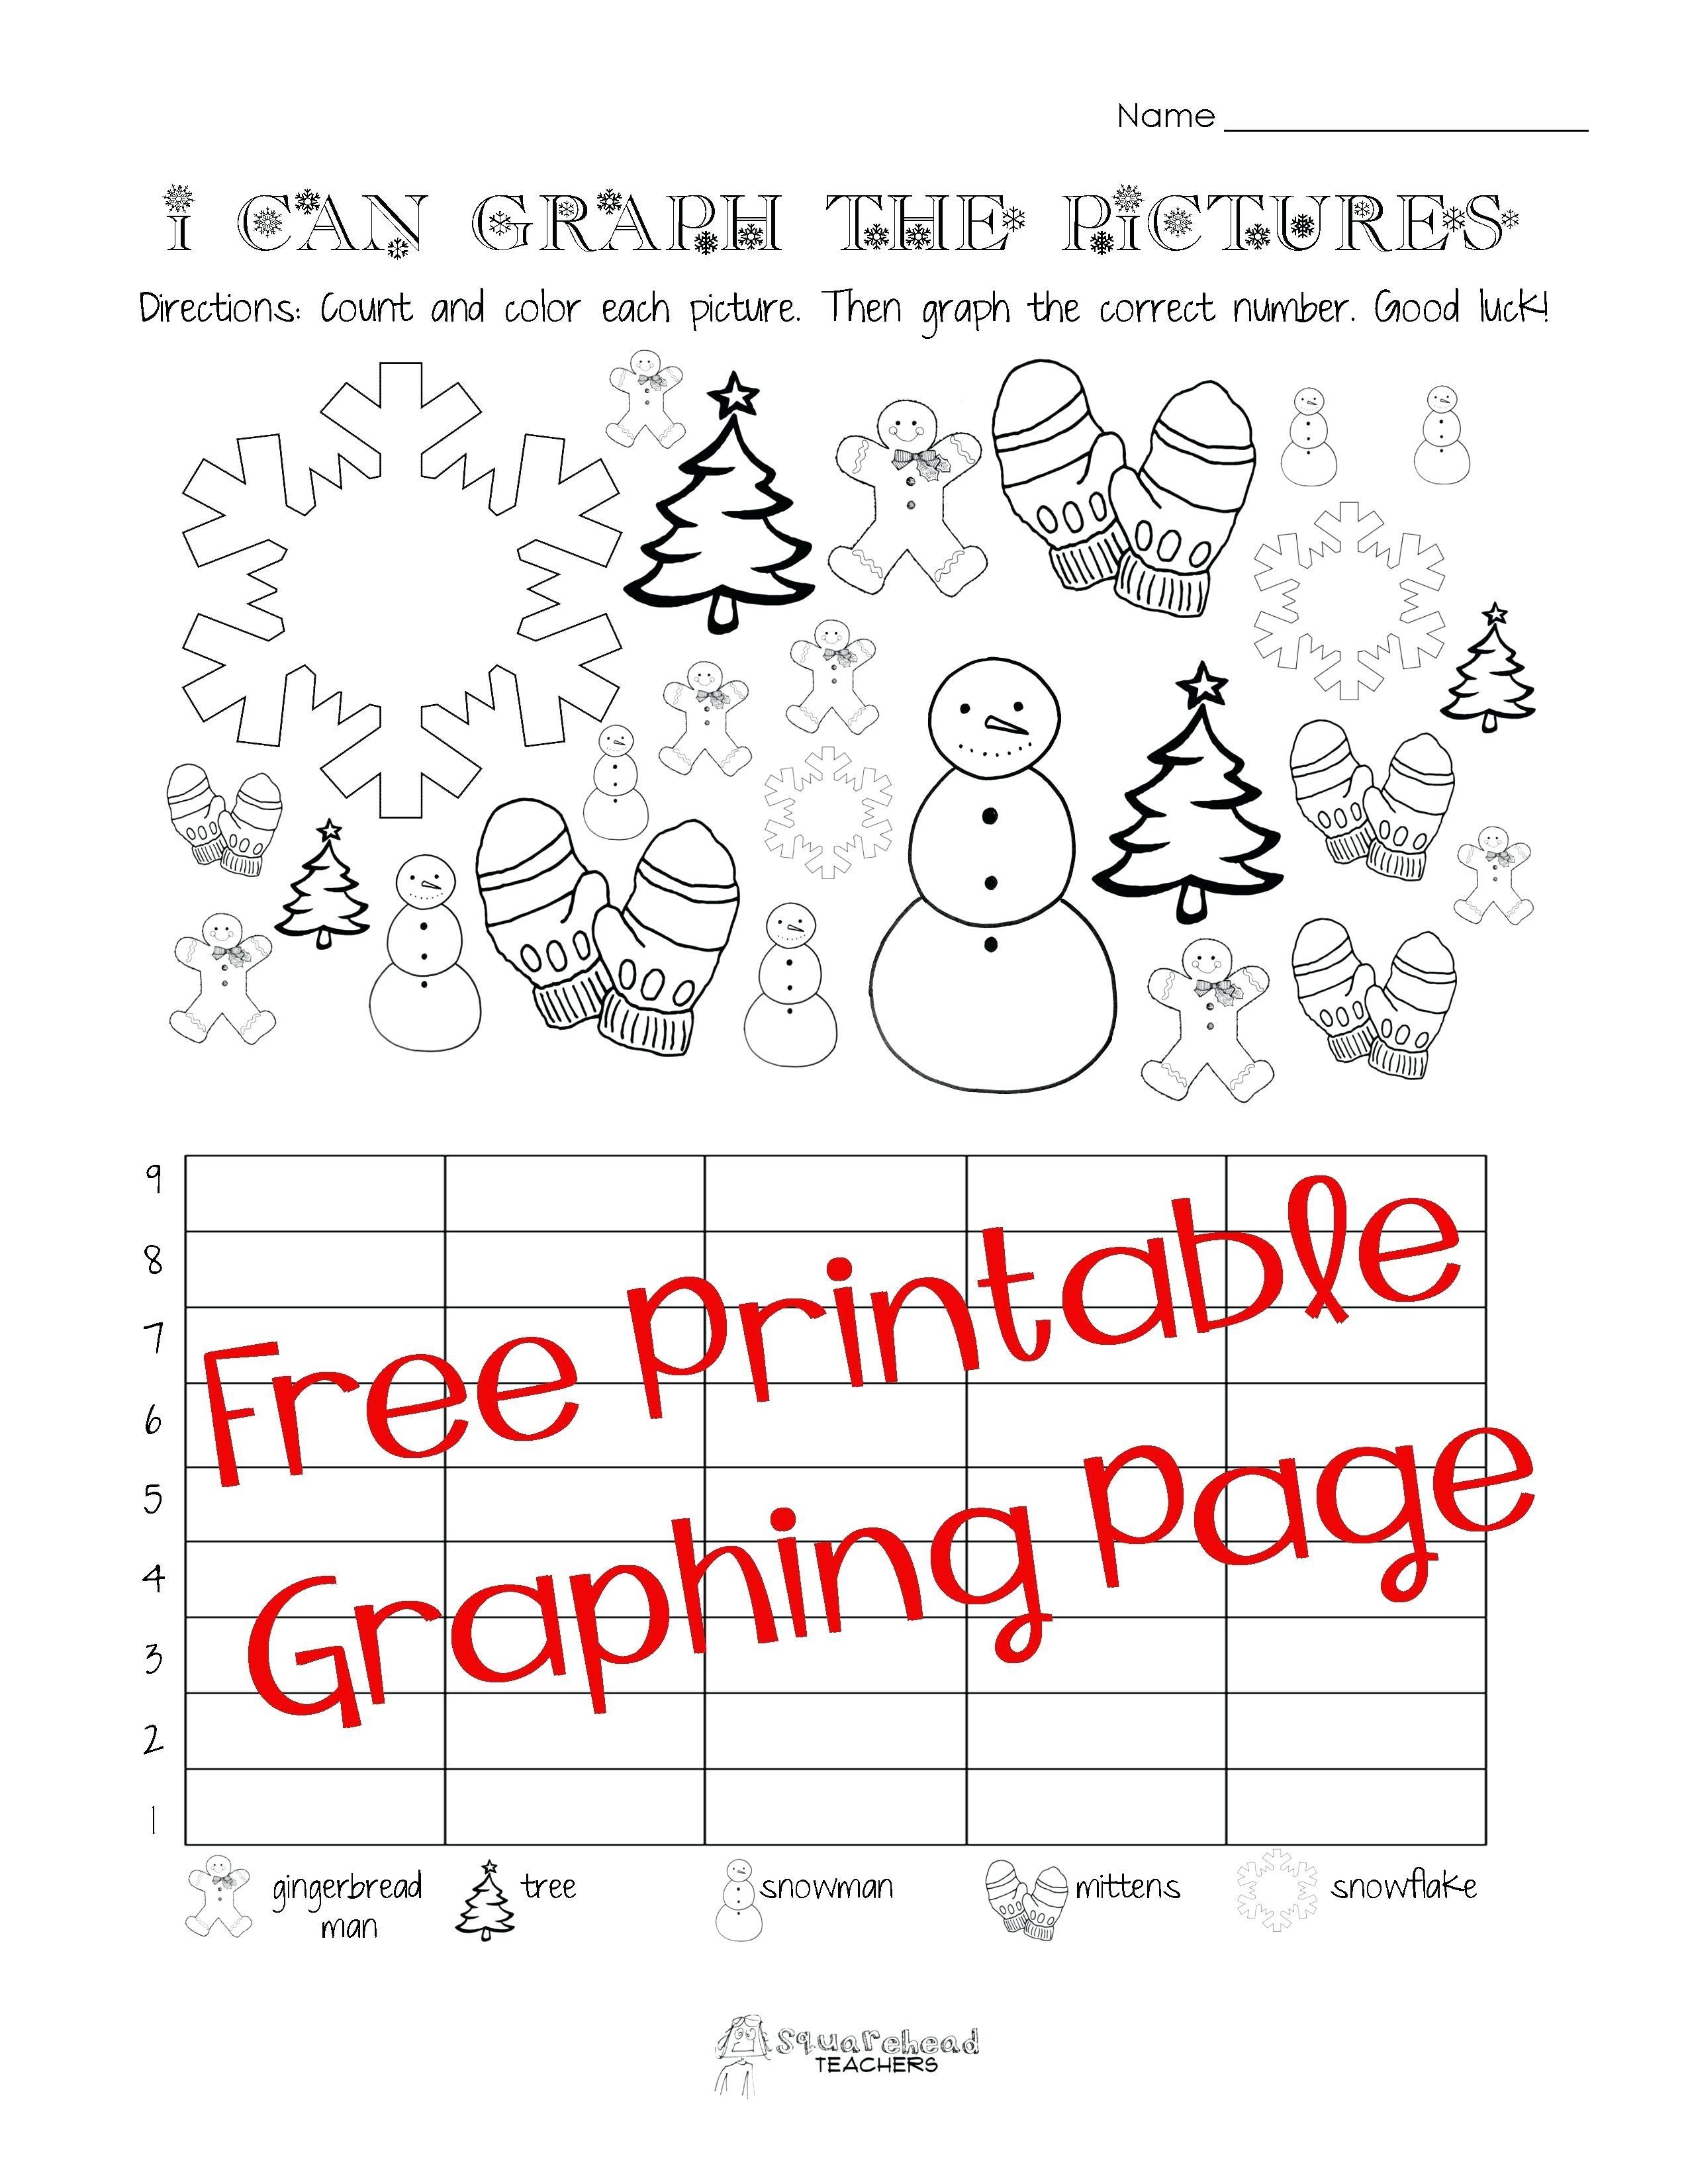 Reading Worksheets For 1St Grade Math – Nagasakee.club - Free Printable Language Arts Worksheets For 1St Grade